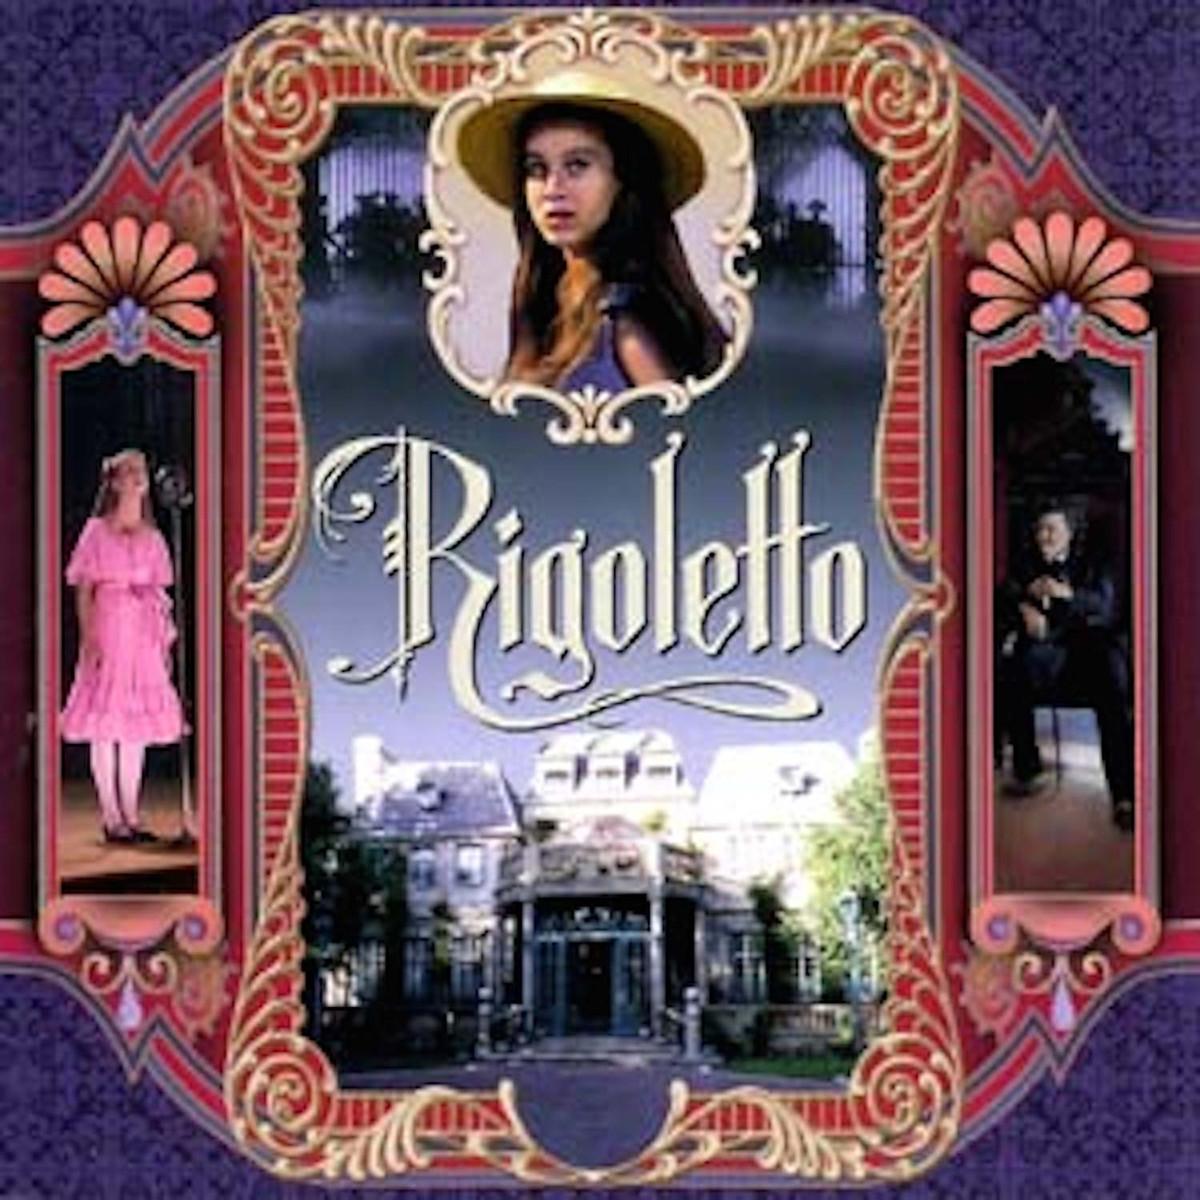 Rigoletto original score for House music 1993